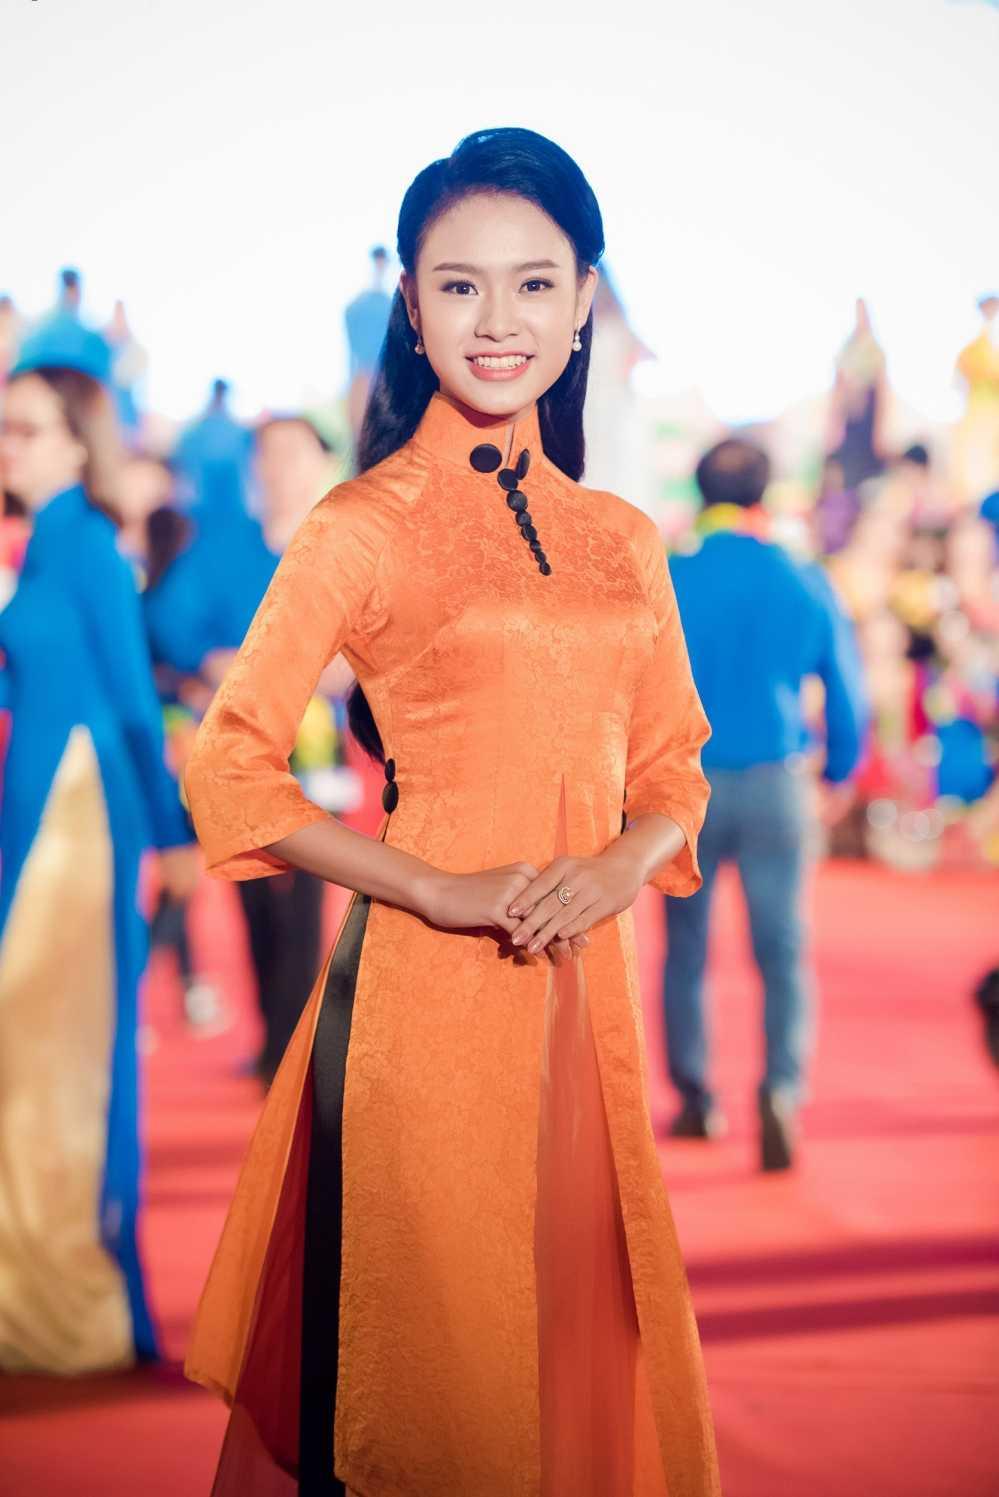 Nguoi dep hoc gioi nhat hoa hau Viet Nam bi fans 'bao vay' o su kien hinh anh 1